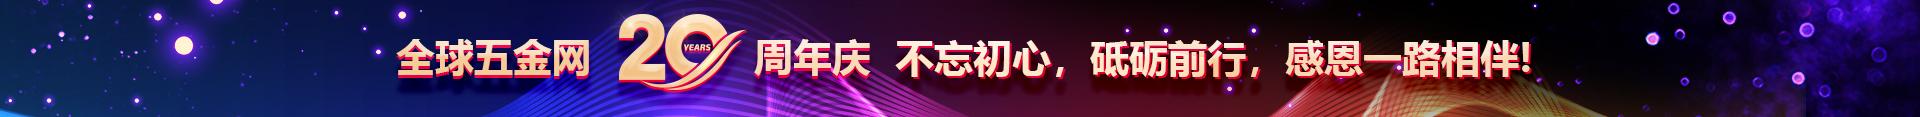 全球五金网20周年庆典